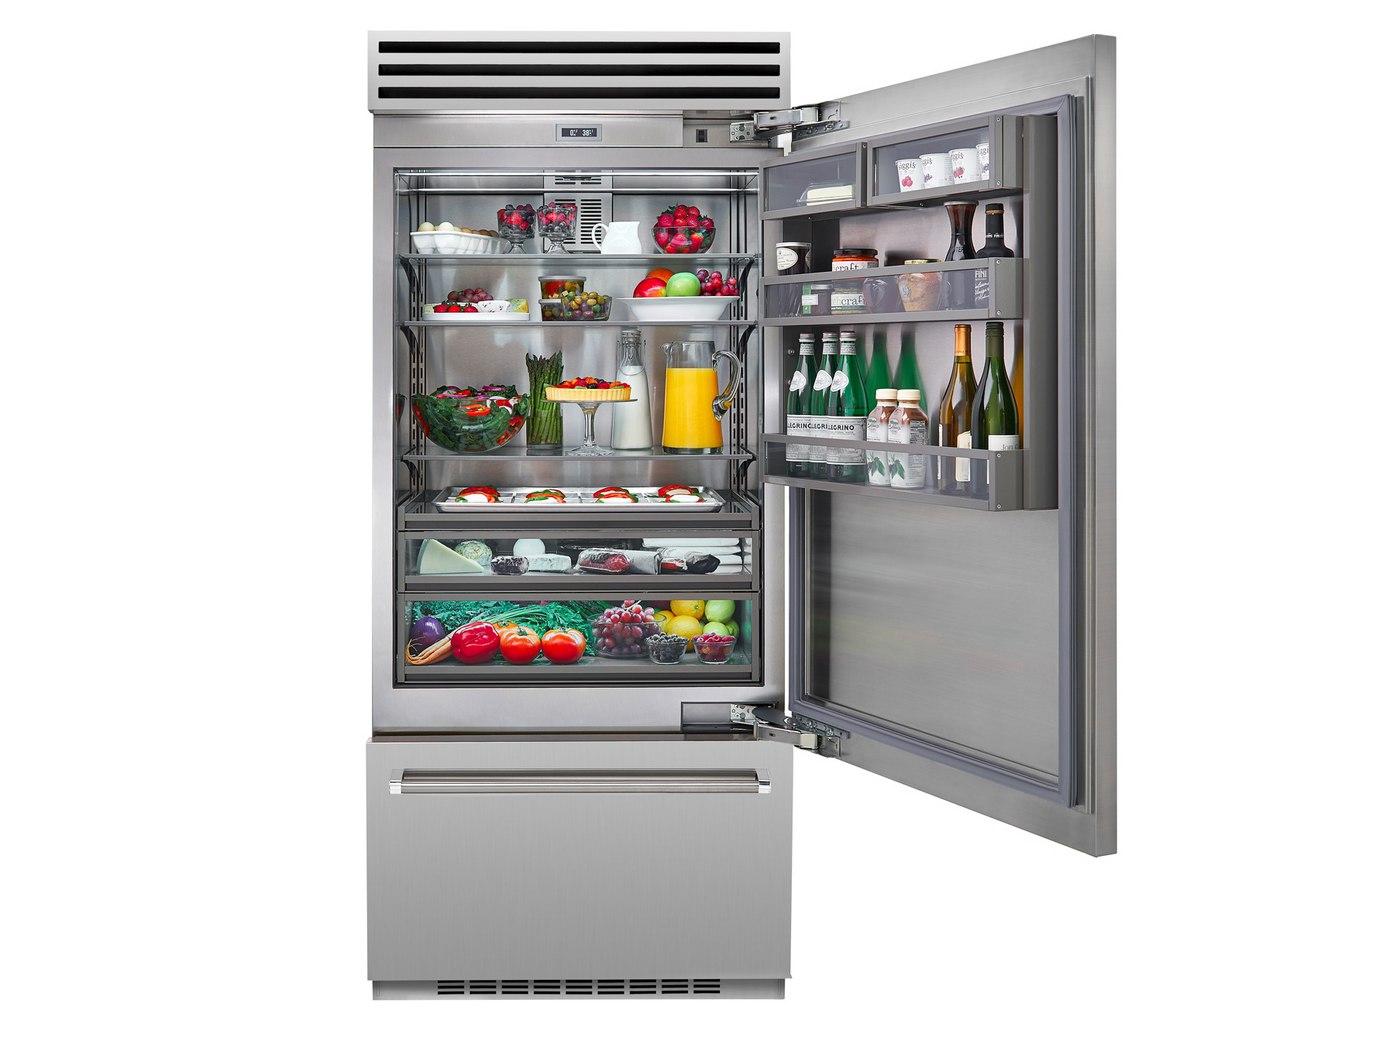 New Bluestar 36 Inch Professional Built In Refrigerator